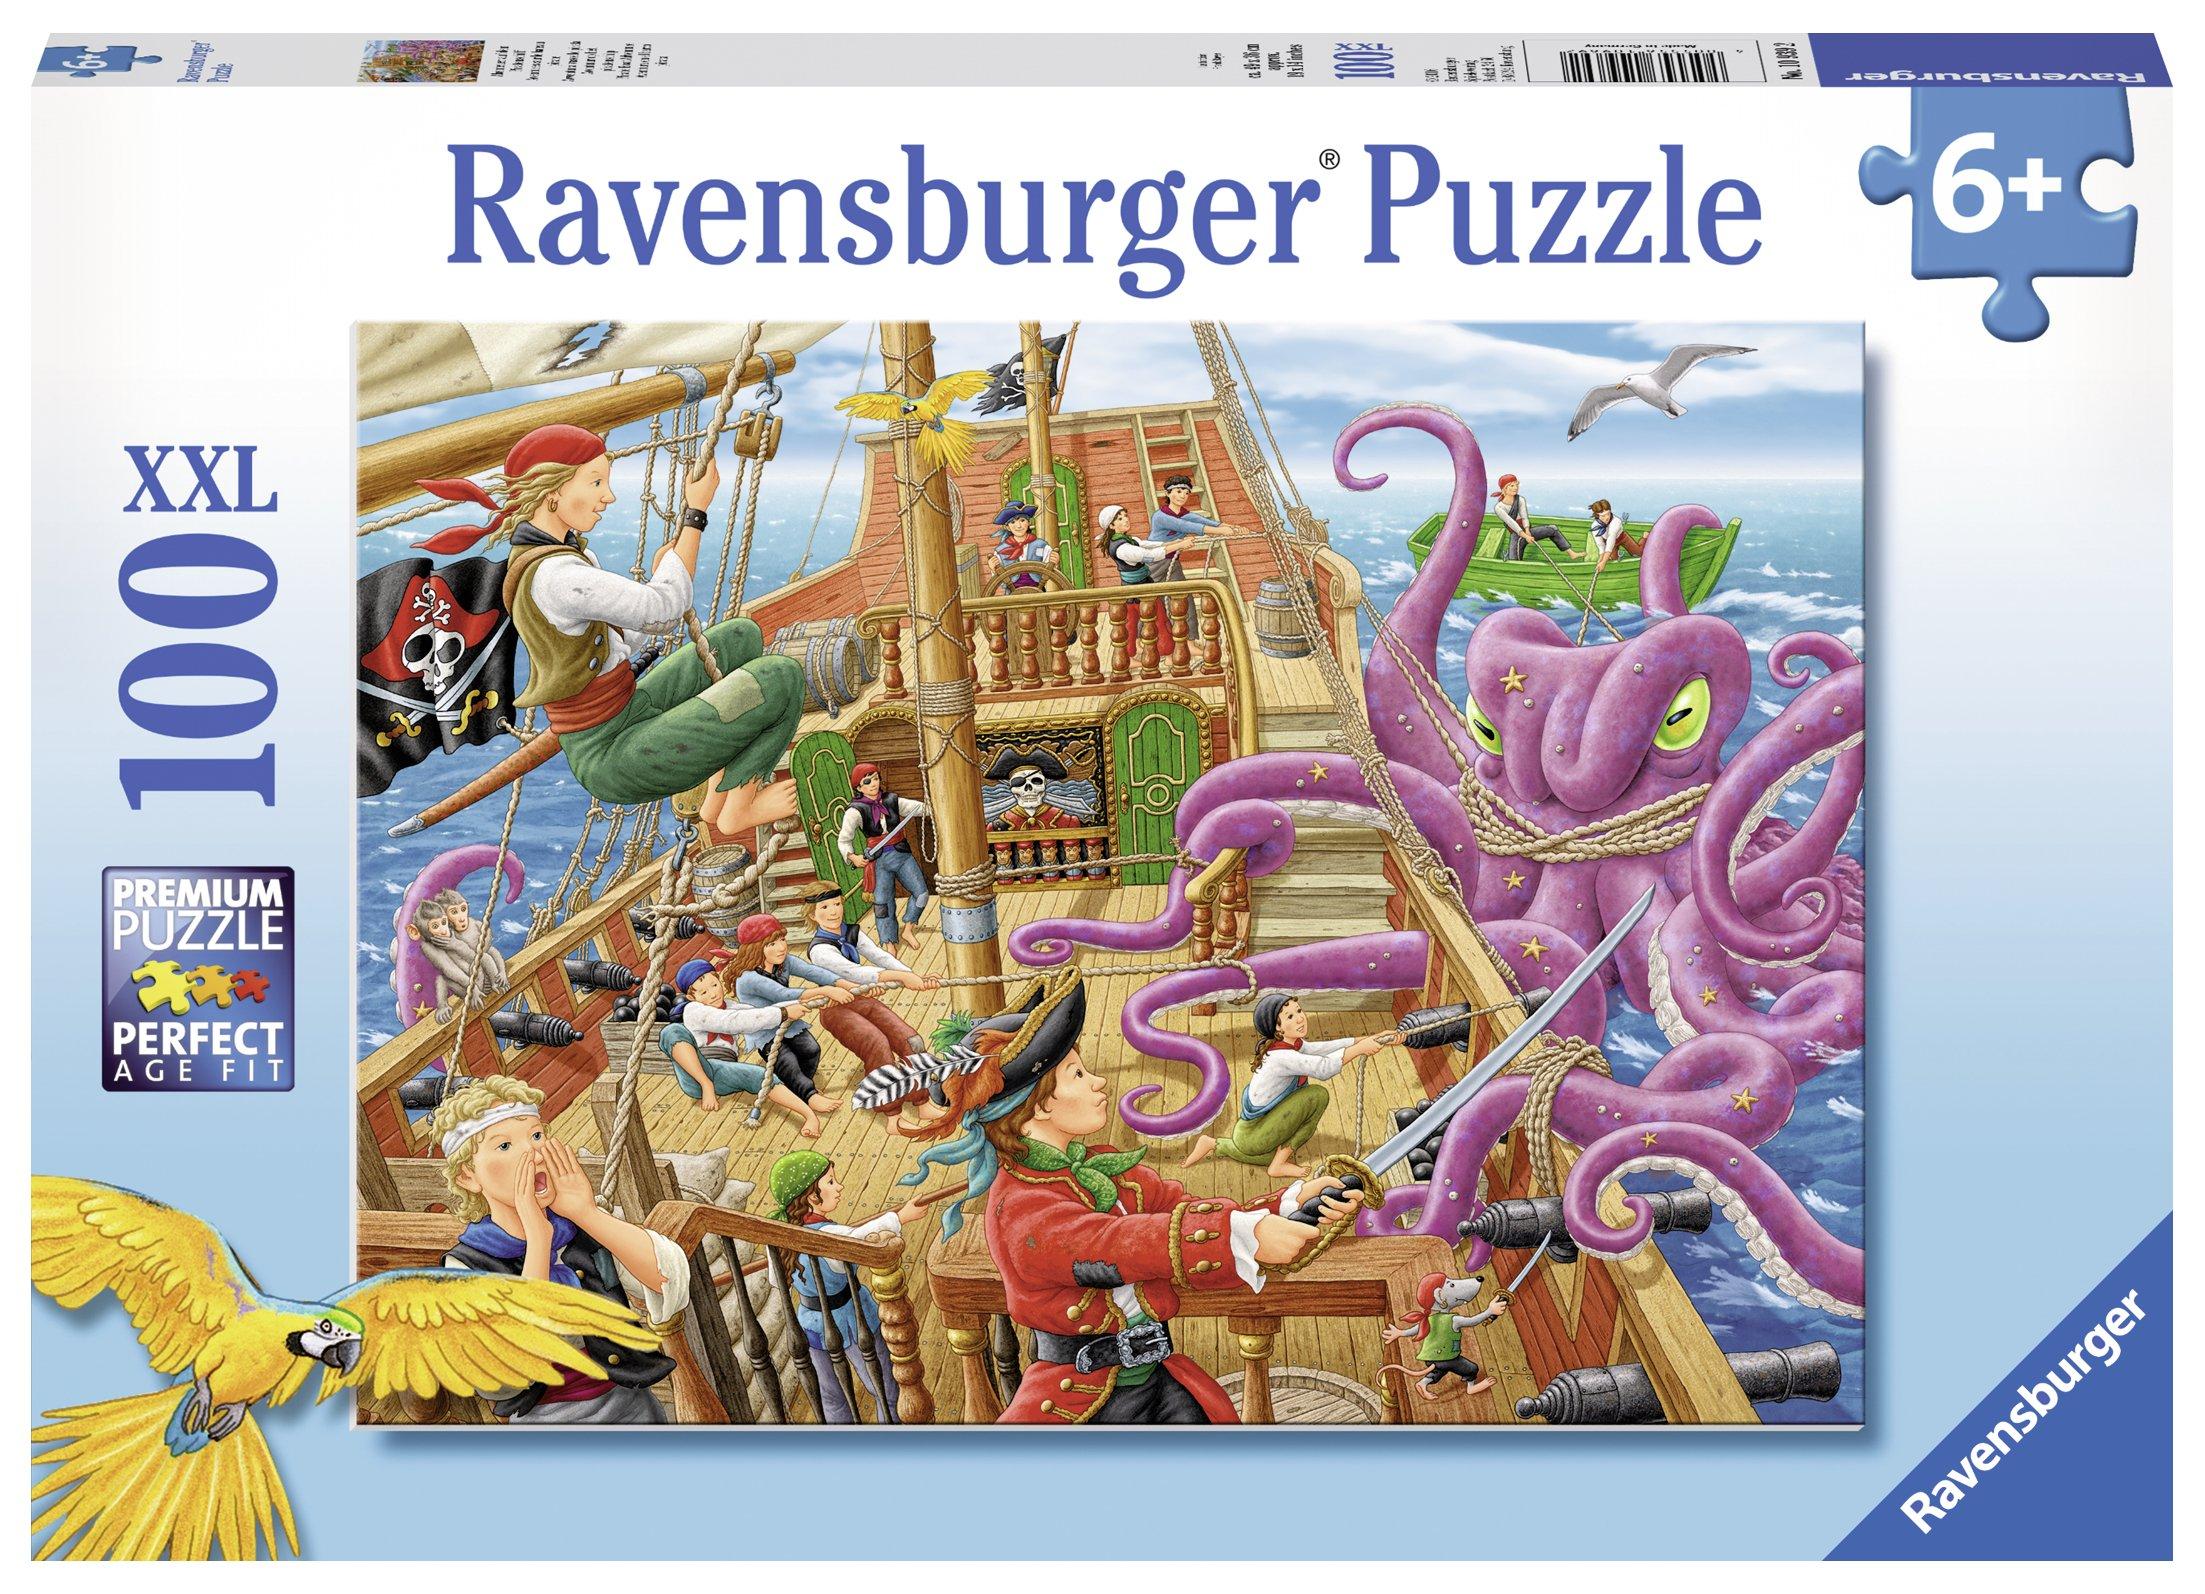 Ravensburger 13695 World of Dinosaurs Jigsaw Puzzles